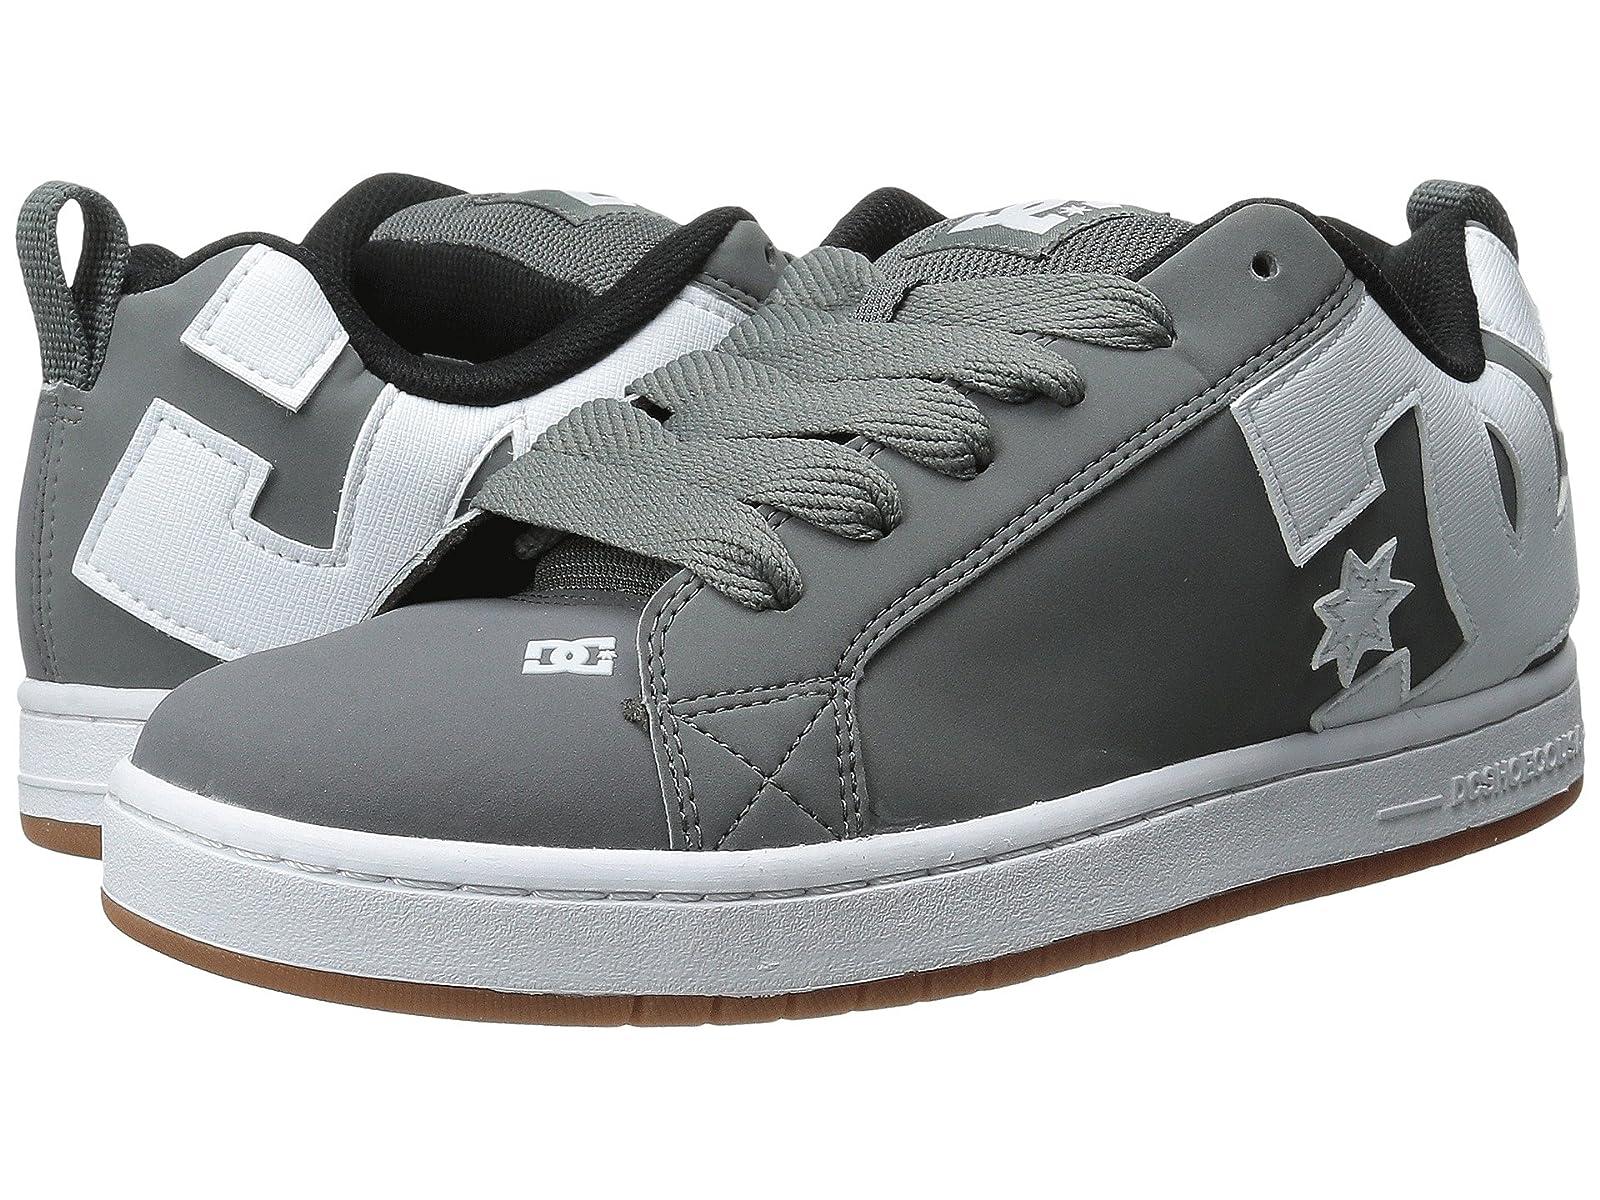 DC Court GraffikCheap and distinctive eye-catching shoes